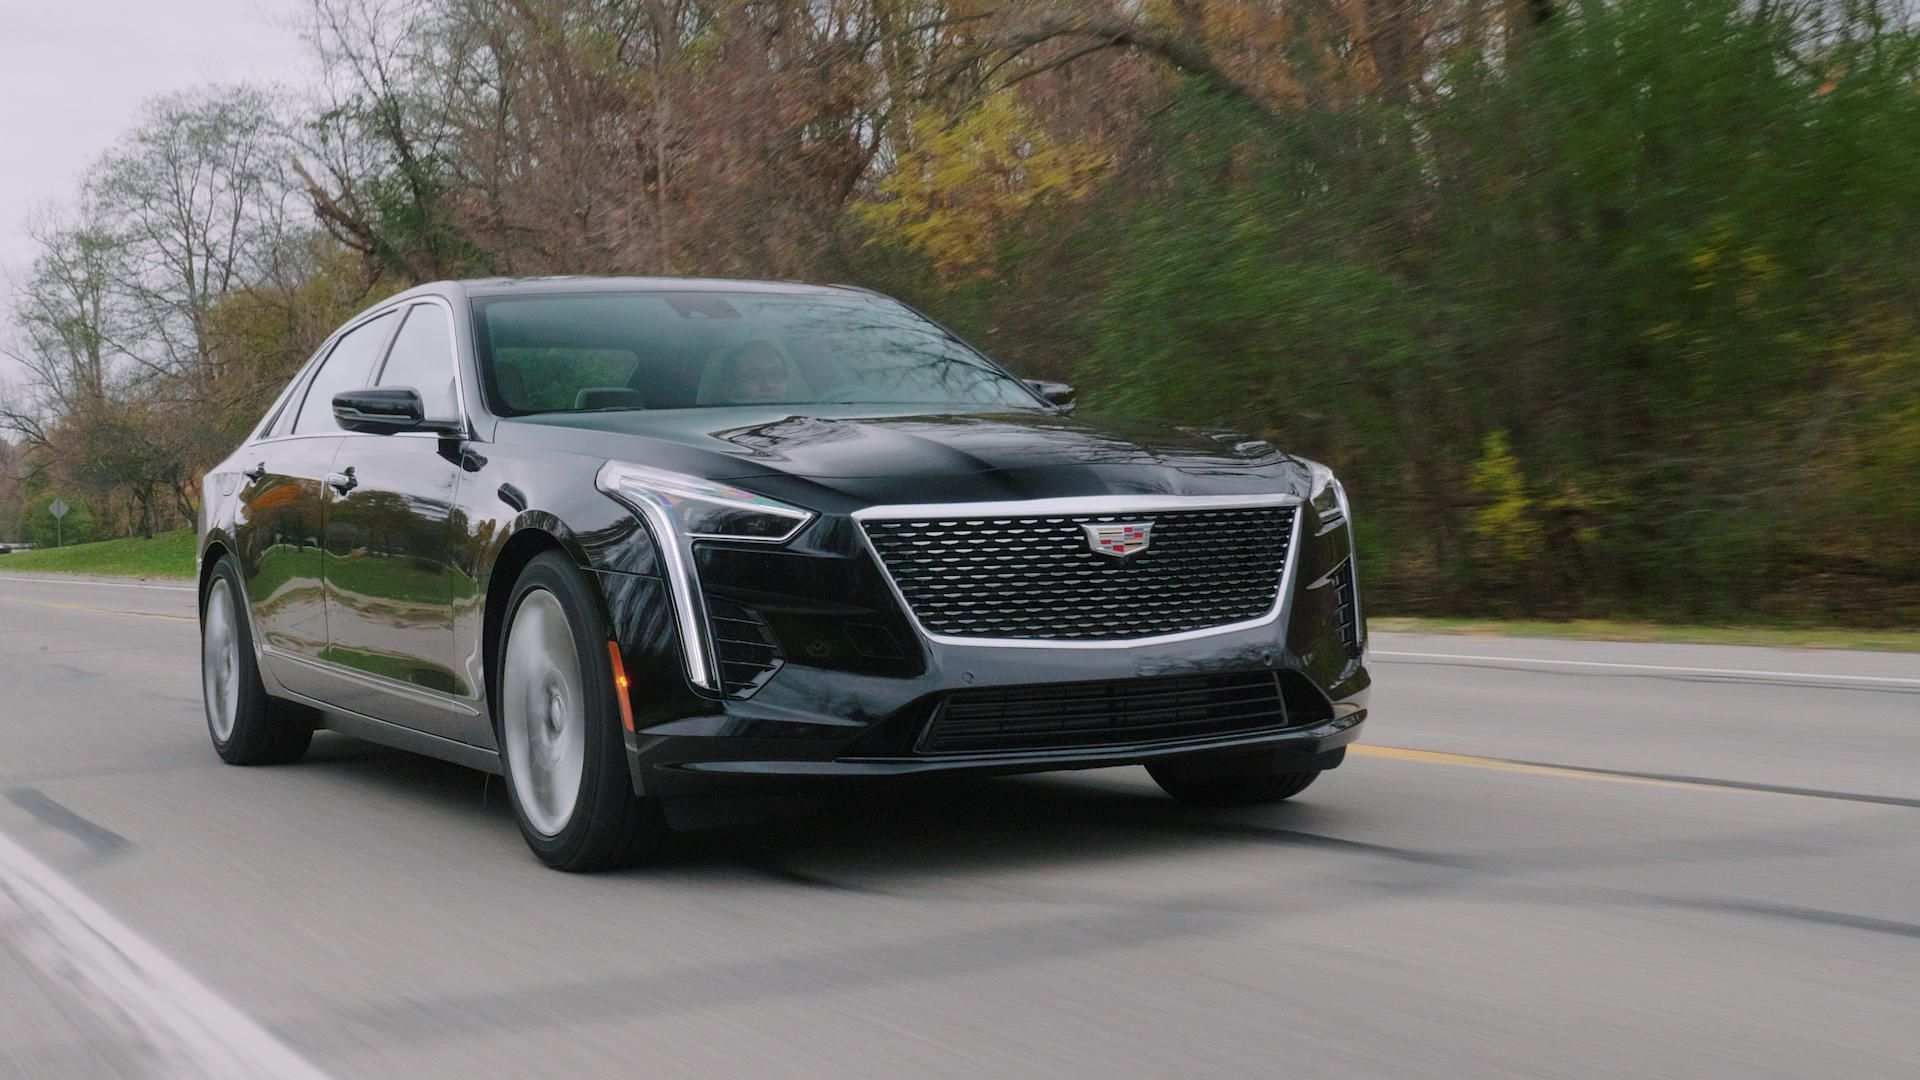 42 New 2019 Cadillac Reviews Specs Exterior for 2019 Cadillac Reviews Specs